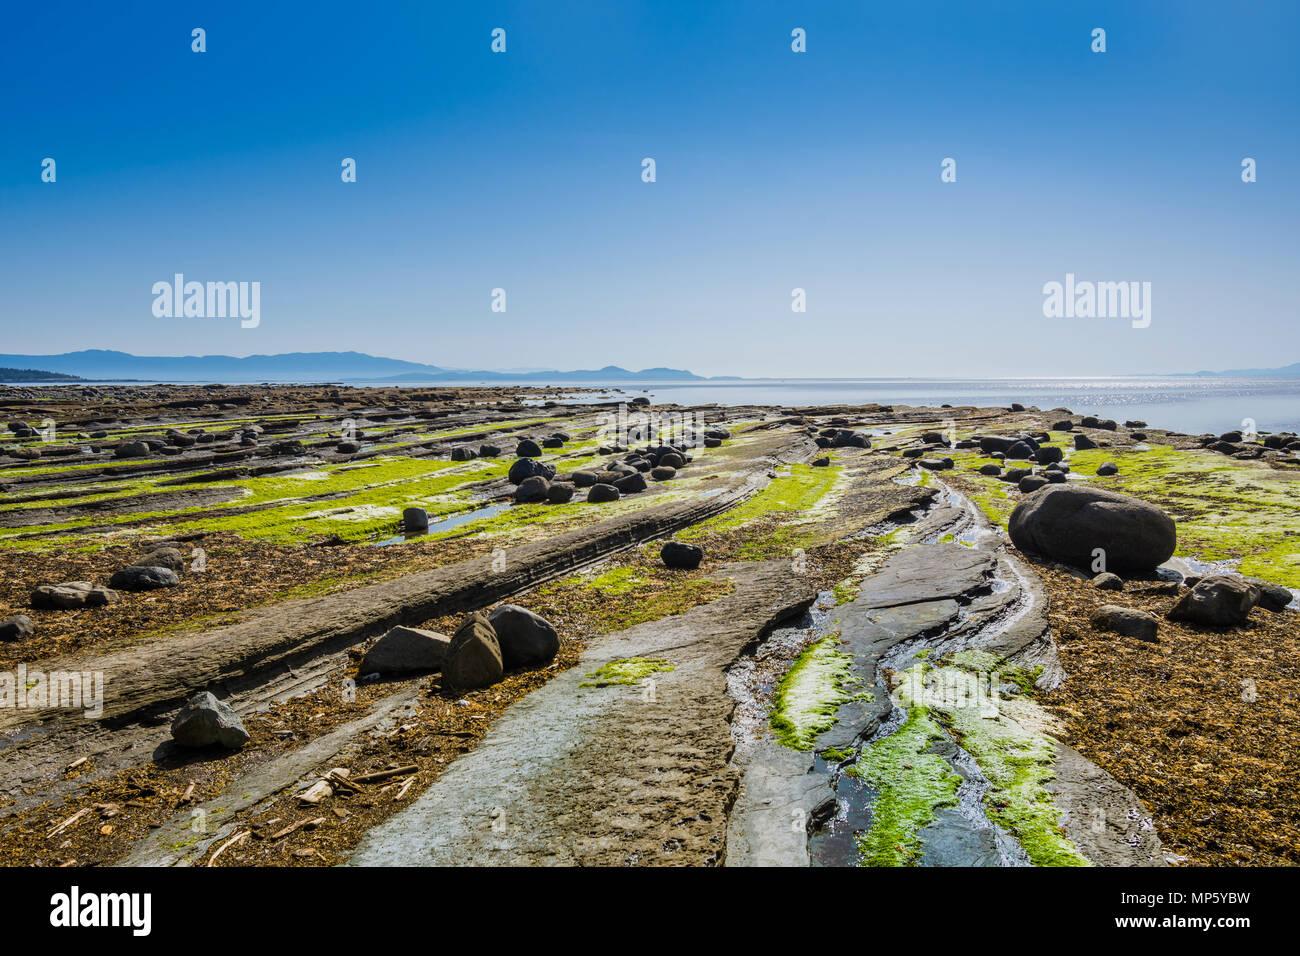 Rocky shore, Sandpiper beach, Hornby Island, BC, Canada. - Stock Image